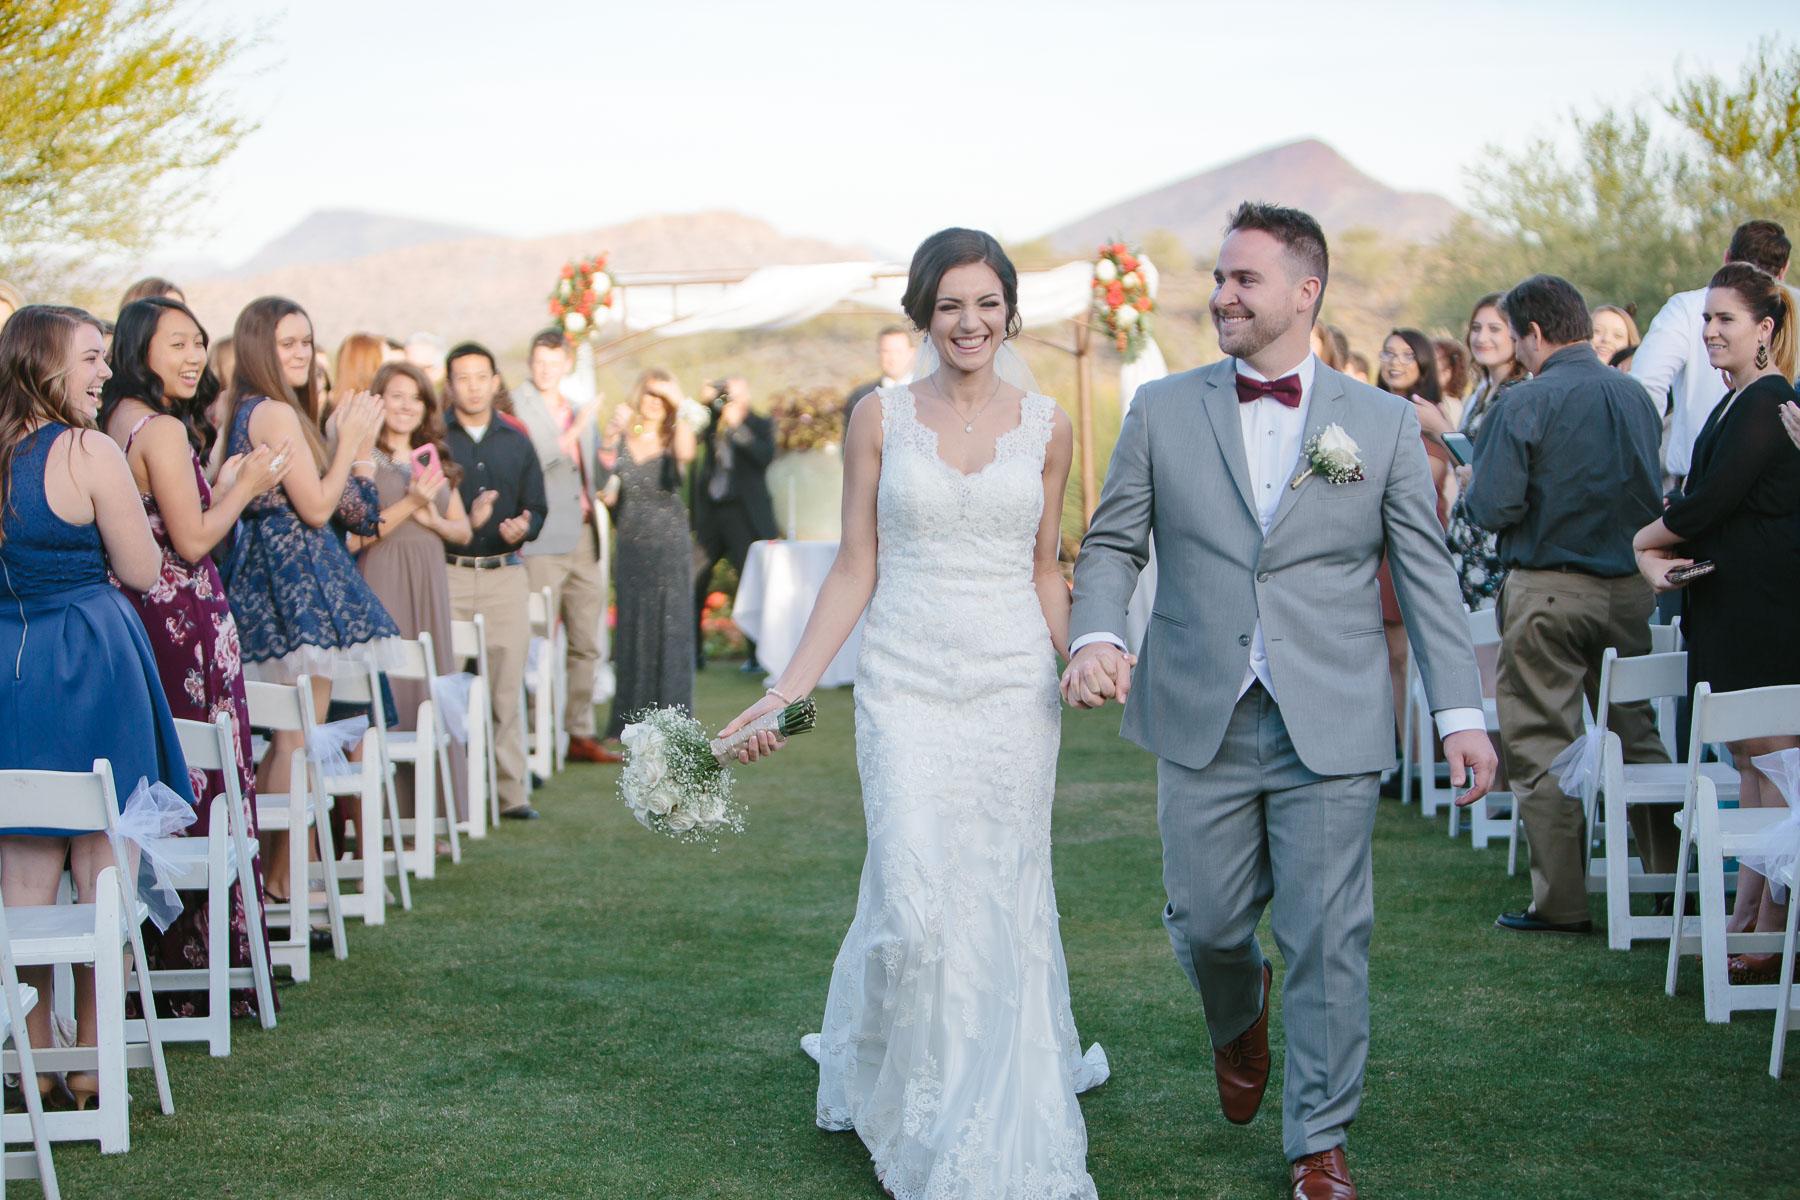 161210-Luxium-Weddings-Arizona-Matt-Jenny-Anthem-Golf-Country-Club-1040.jpg